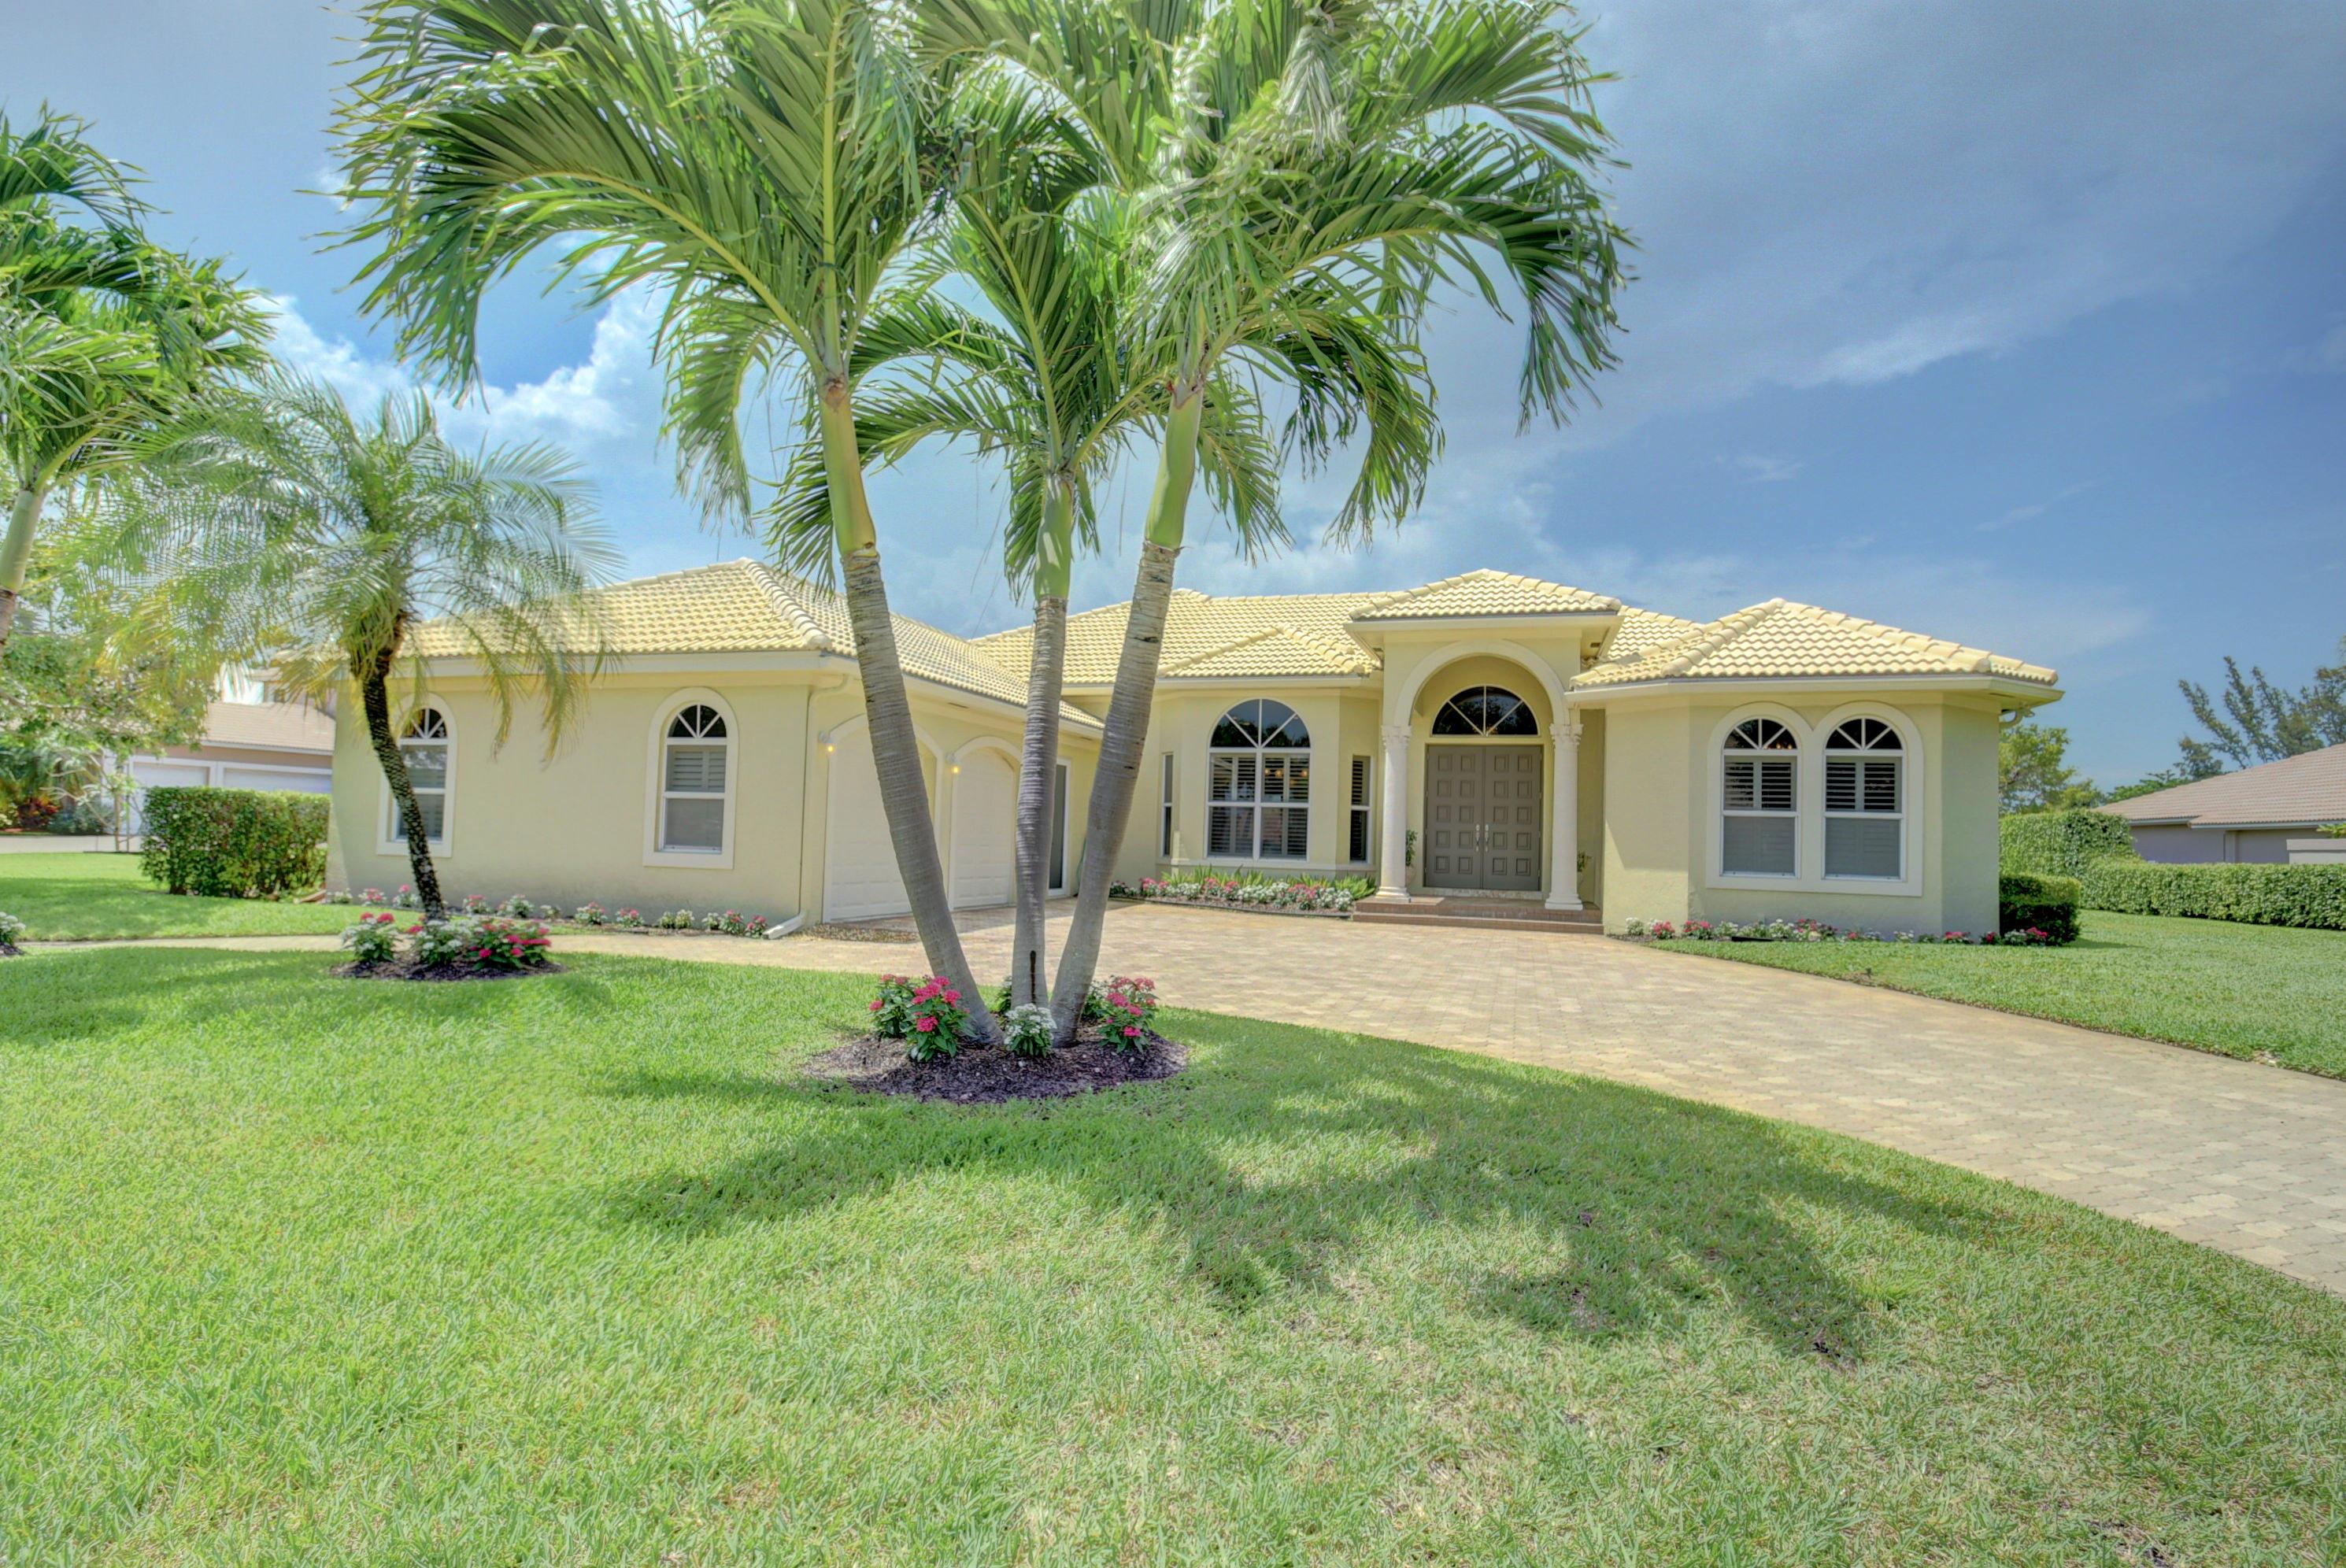 Home for sale in City Of Atlantis Atlantis Florida